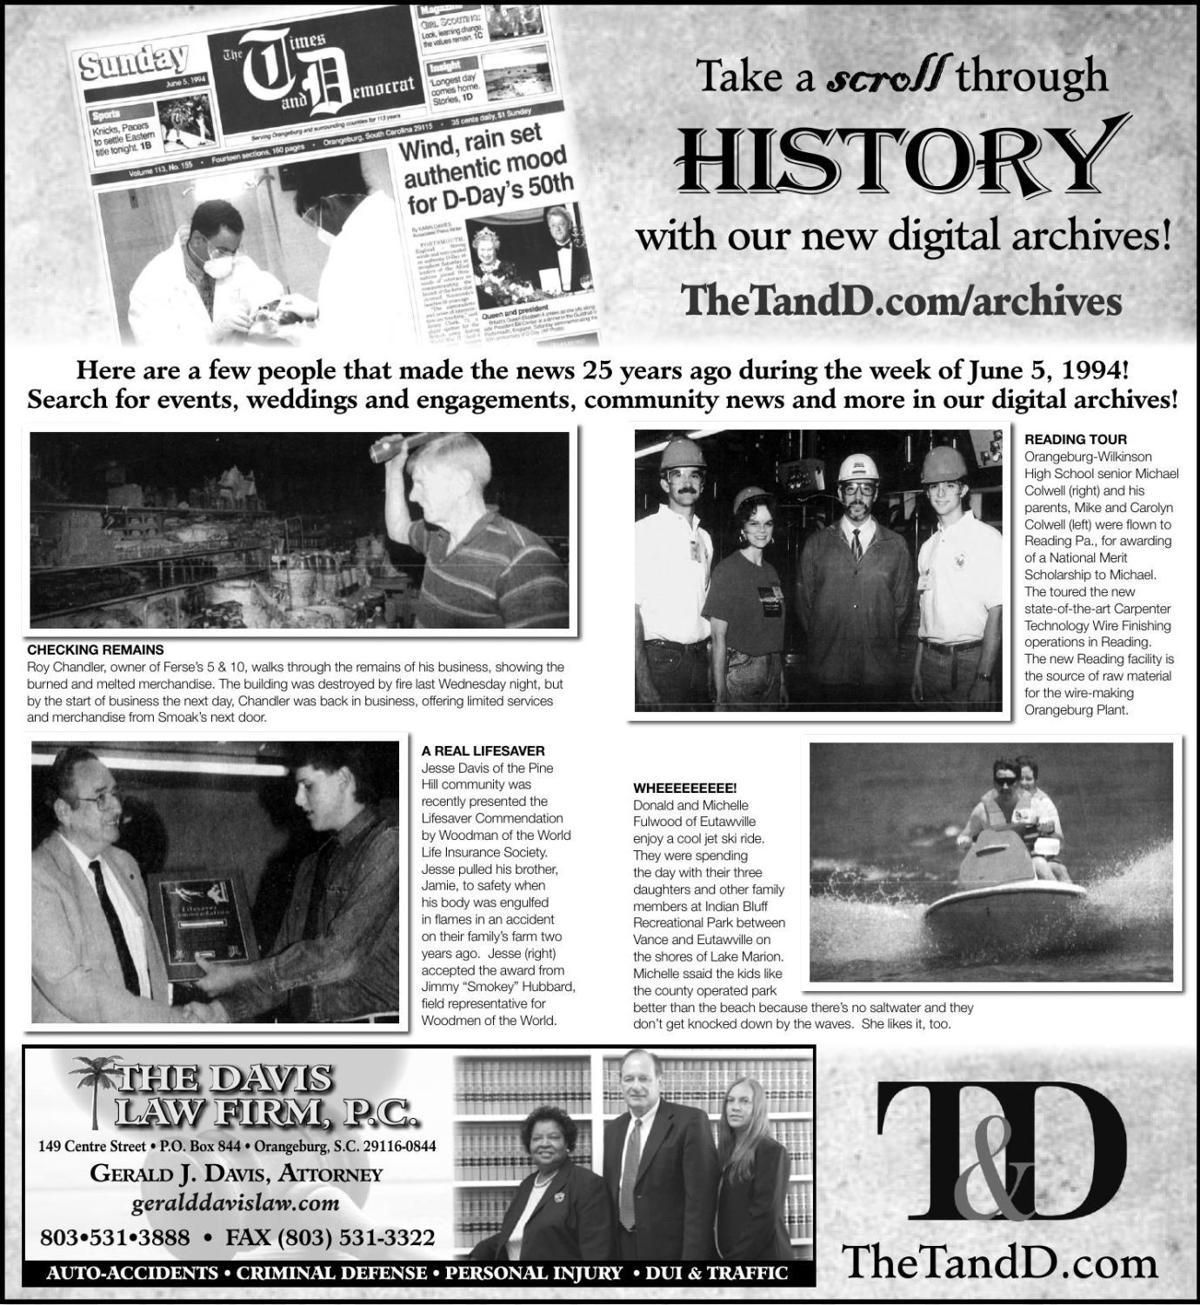 TheTandD.com/archives June 9, 2019